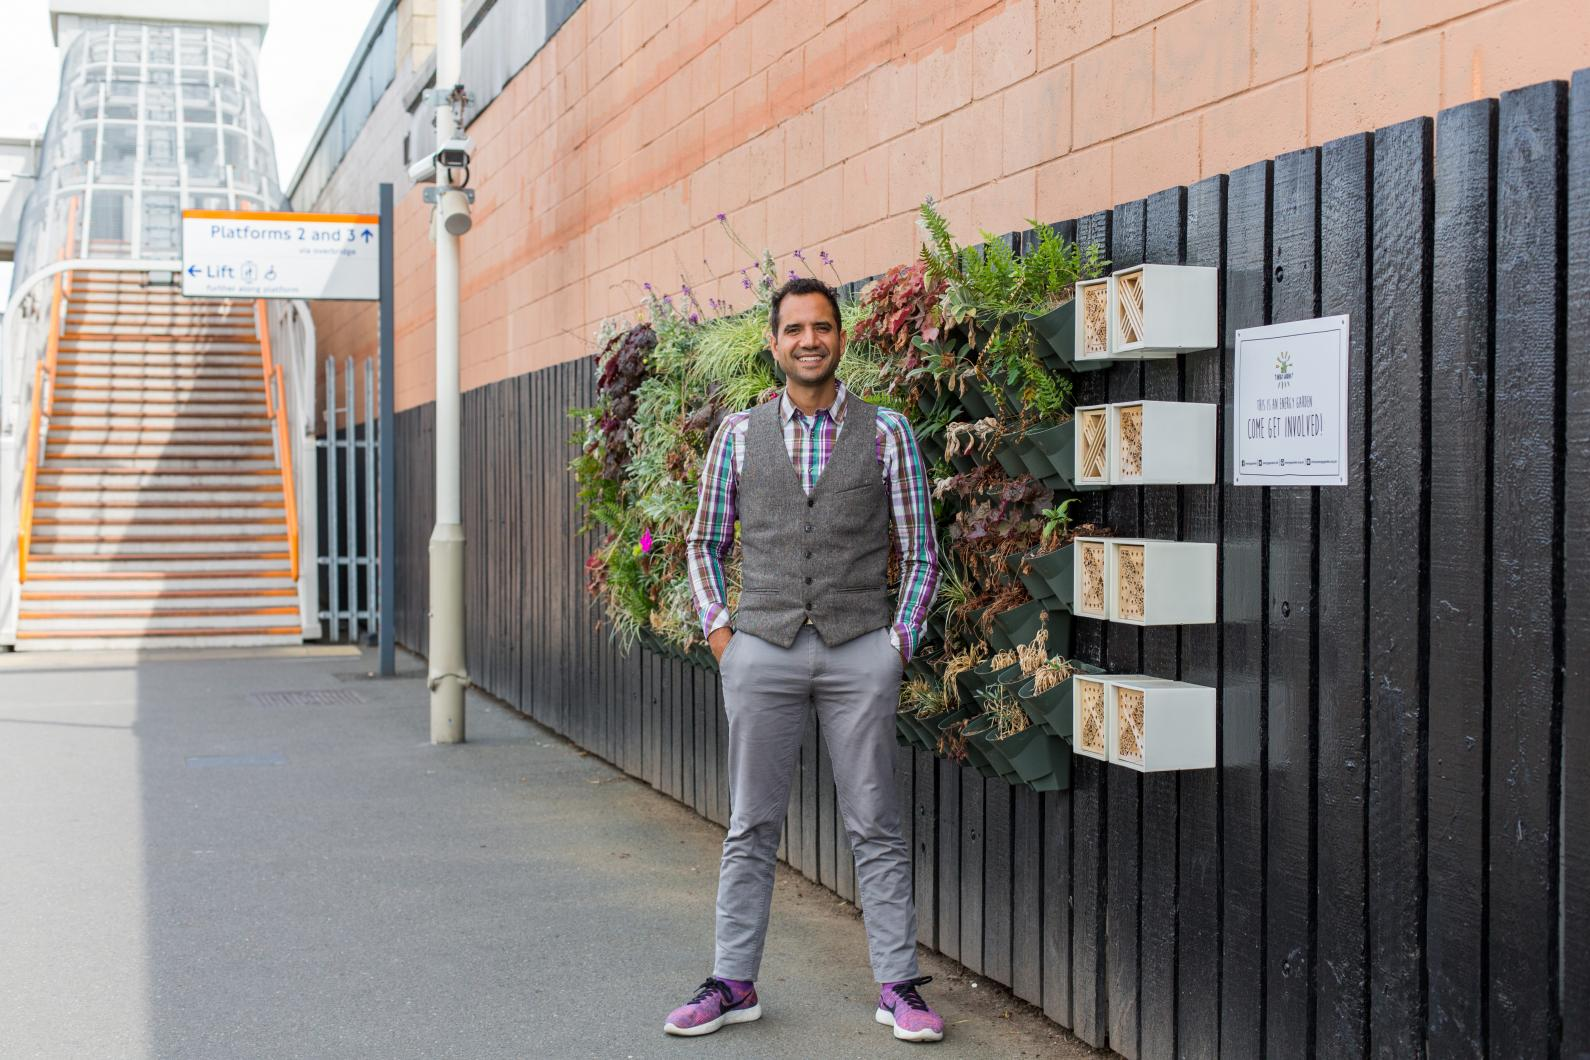 Agamenmon Otero visits an overground station energy garden